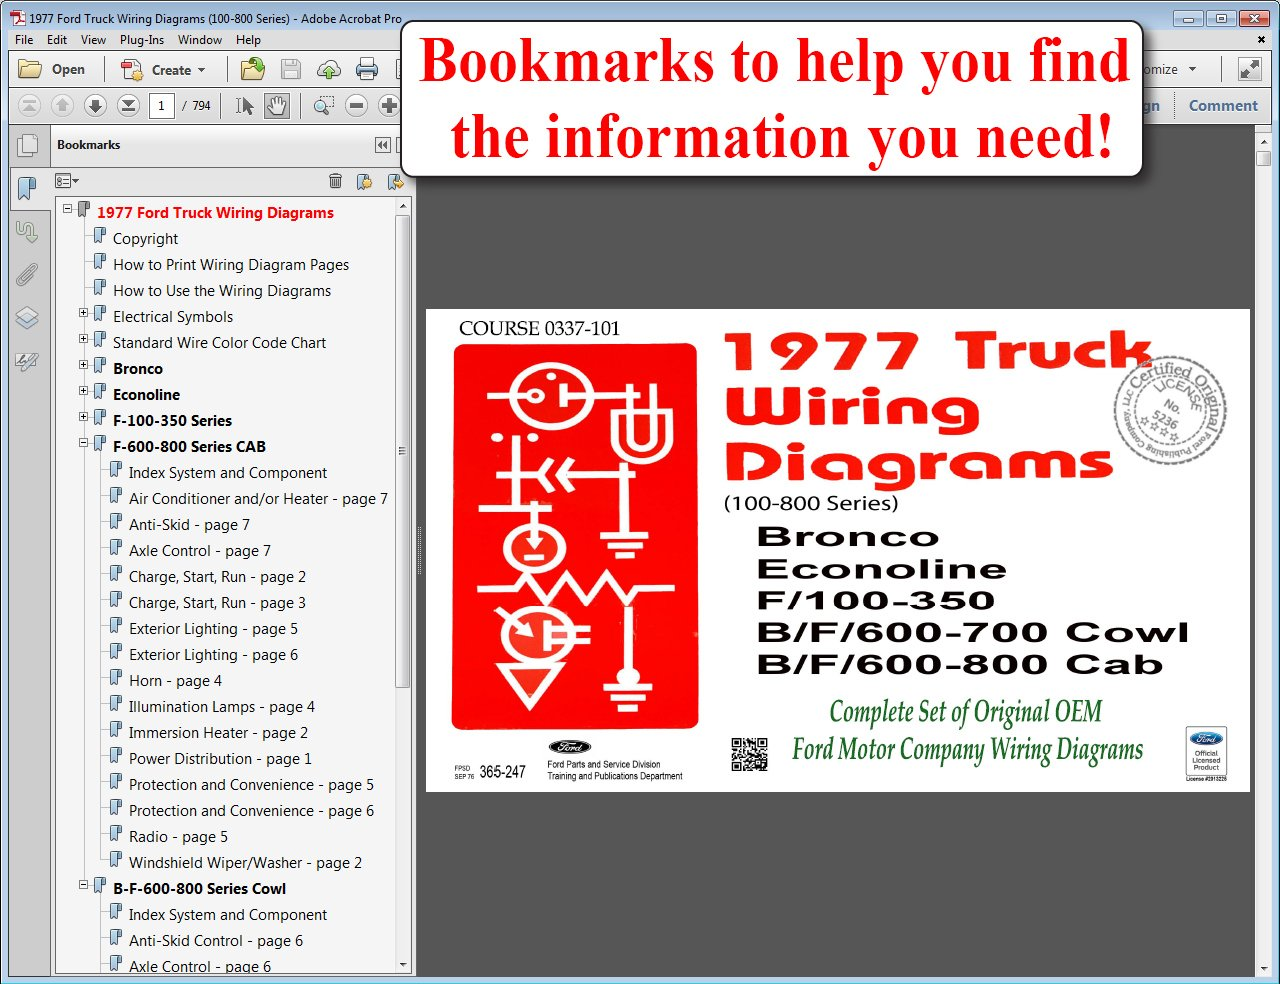 1977 Ford Truck Wiring Diagrams (100-800 Series) Bronco, Econoline, F100-350,  F600-700 Cowl, F600-800 Cab: Ford Motor Company: 9781603712057: Amazon.com:  ...